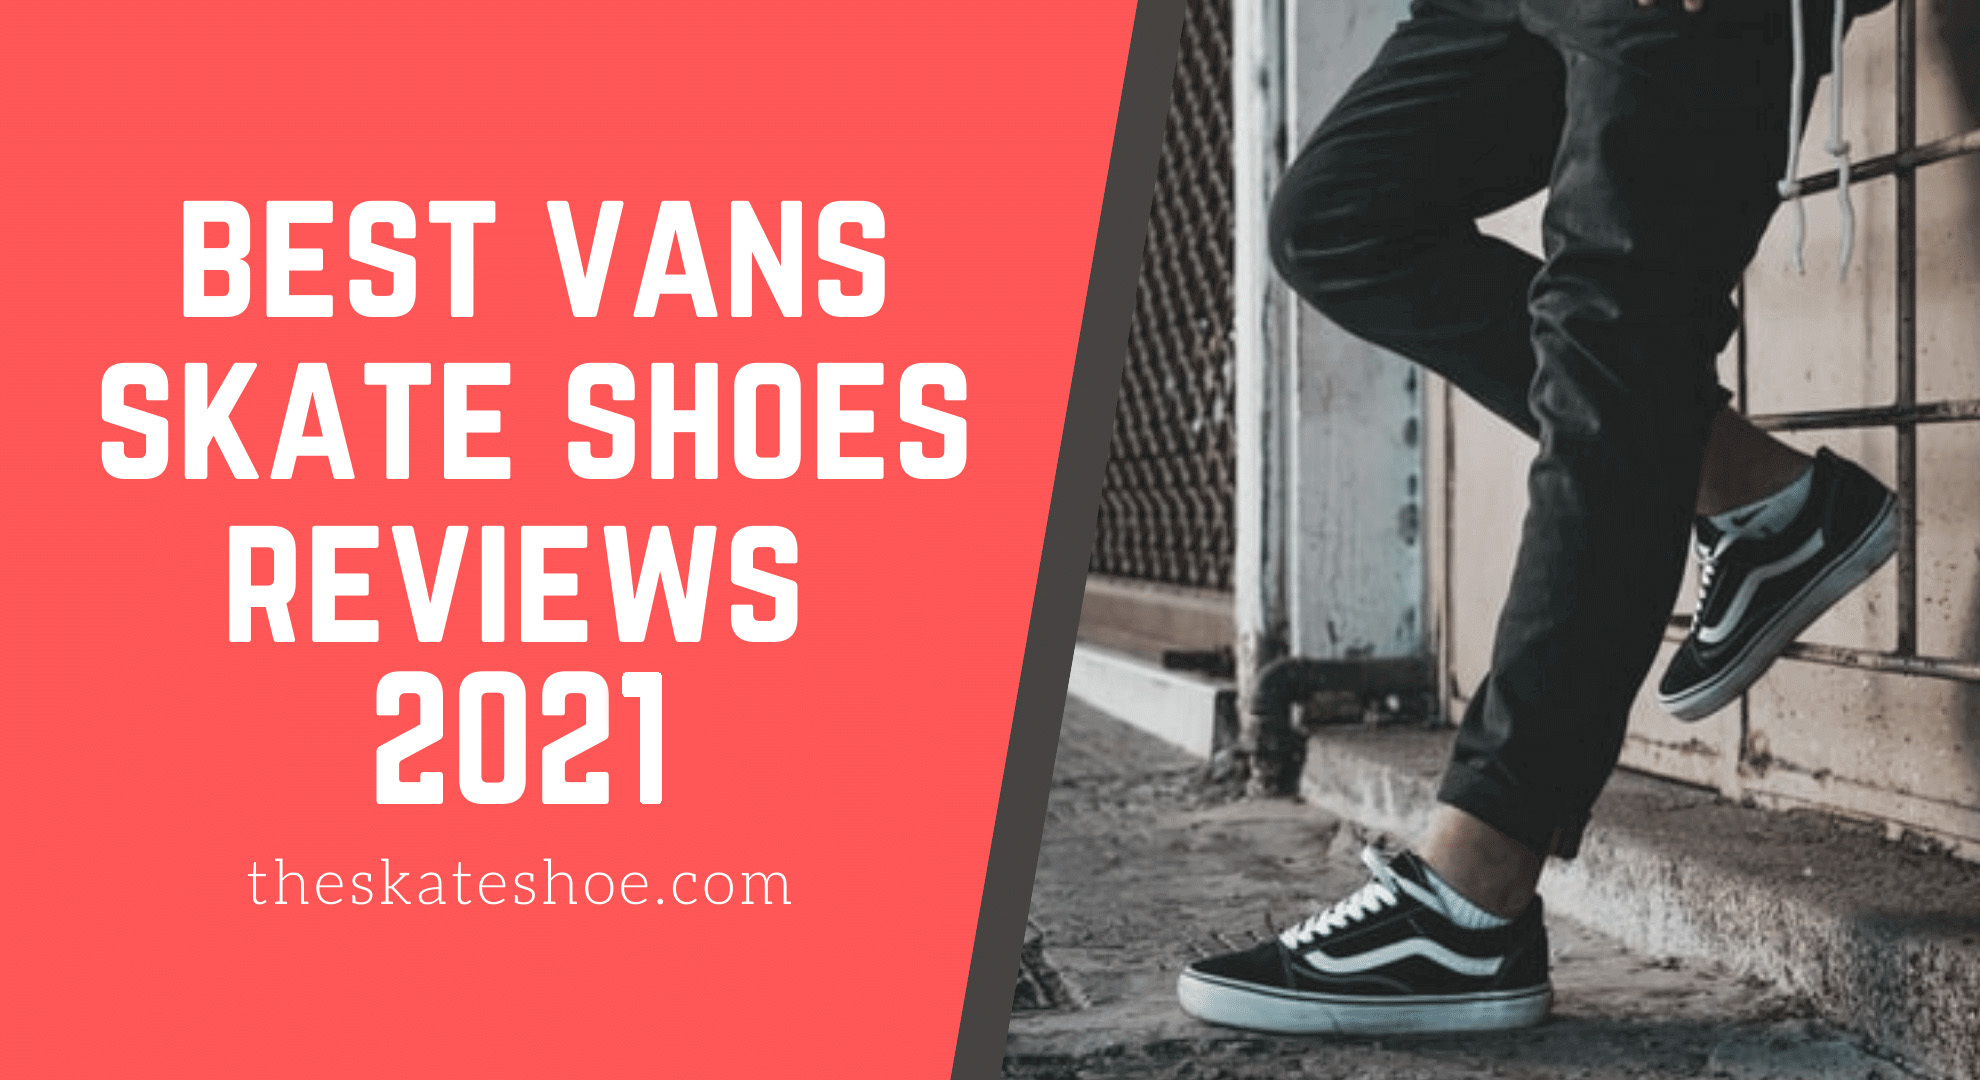 best vans skate shoes 2021